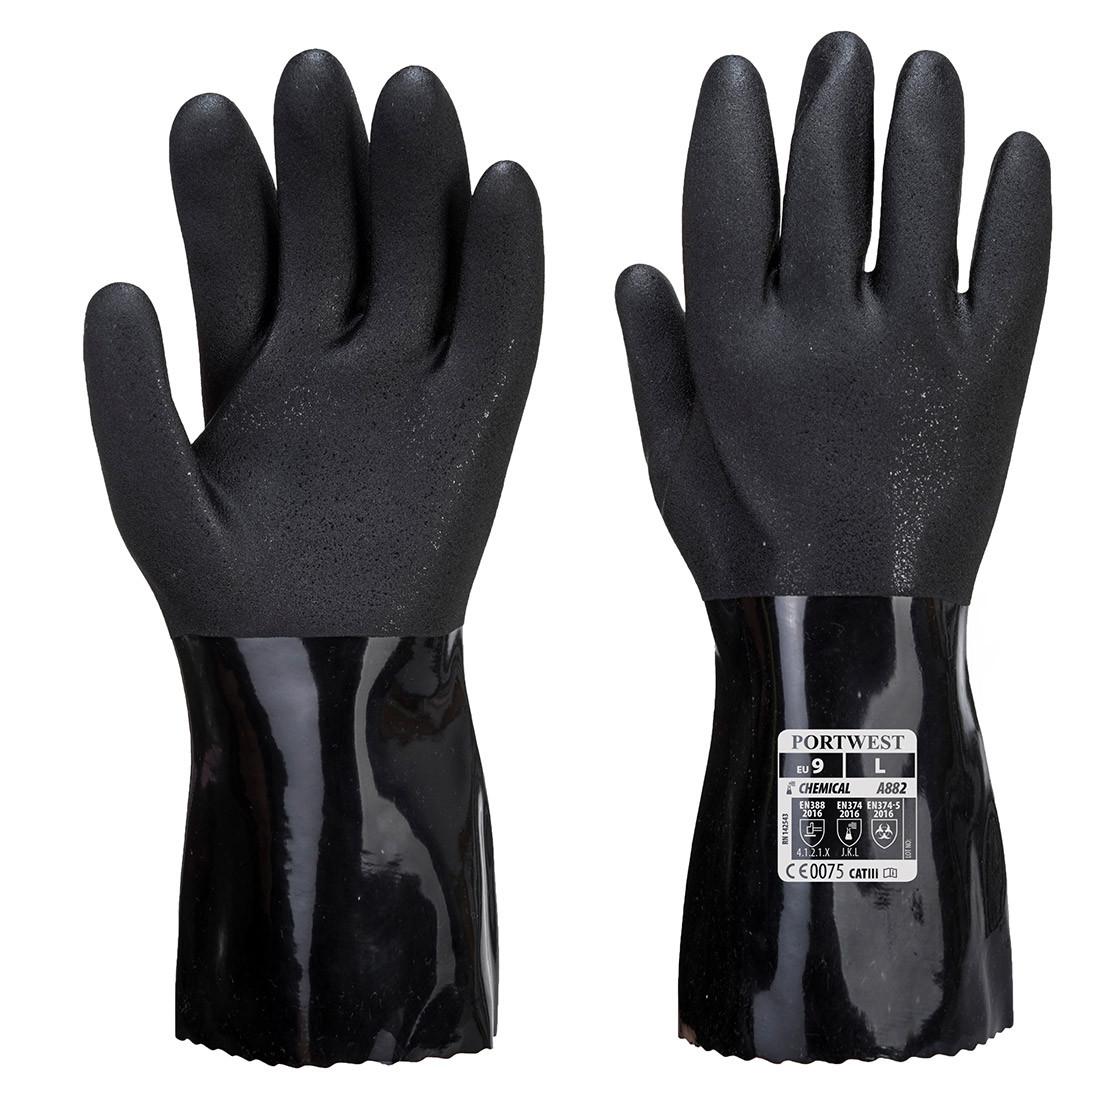 Manusi Chimice ESD PVC - Echipamente de protectie personala